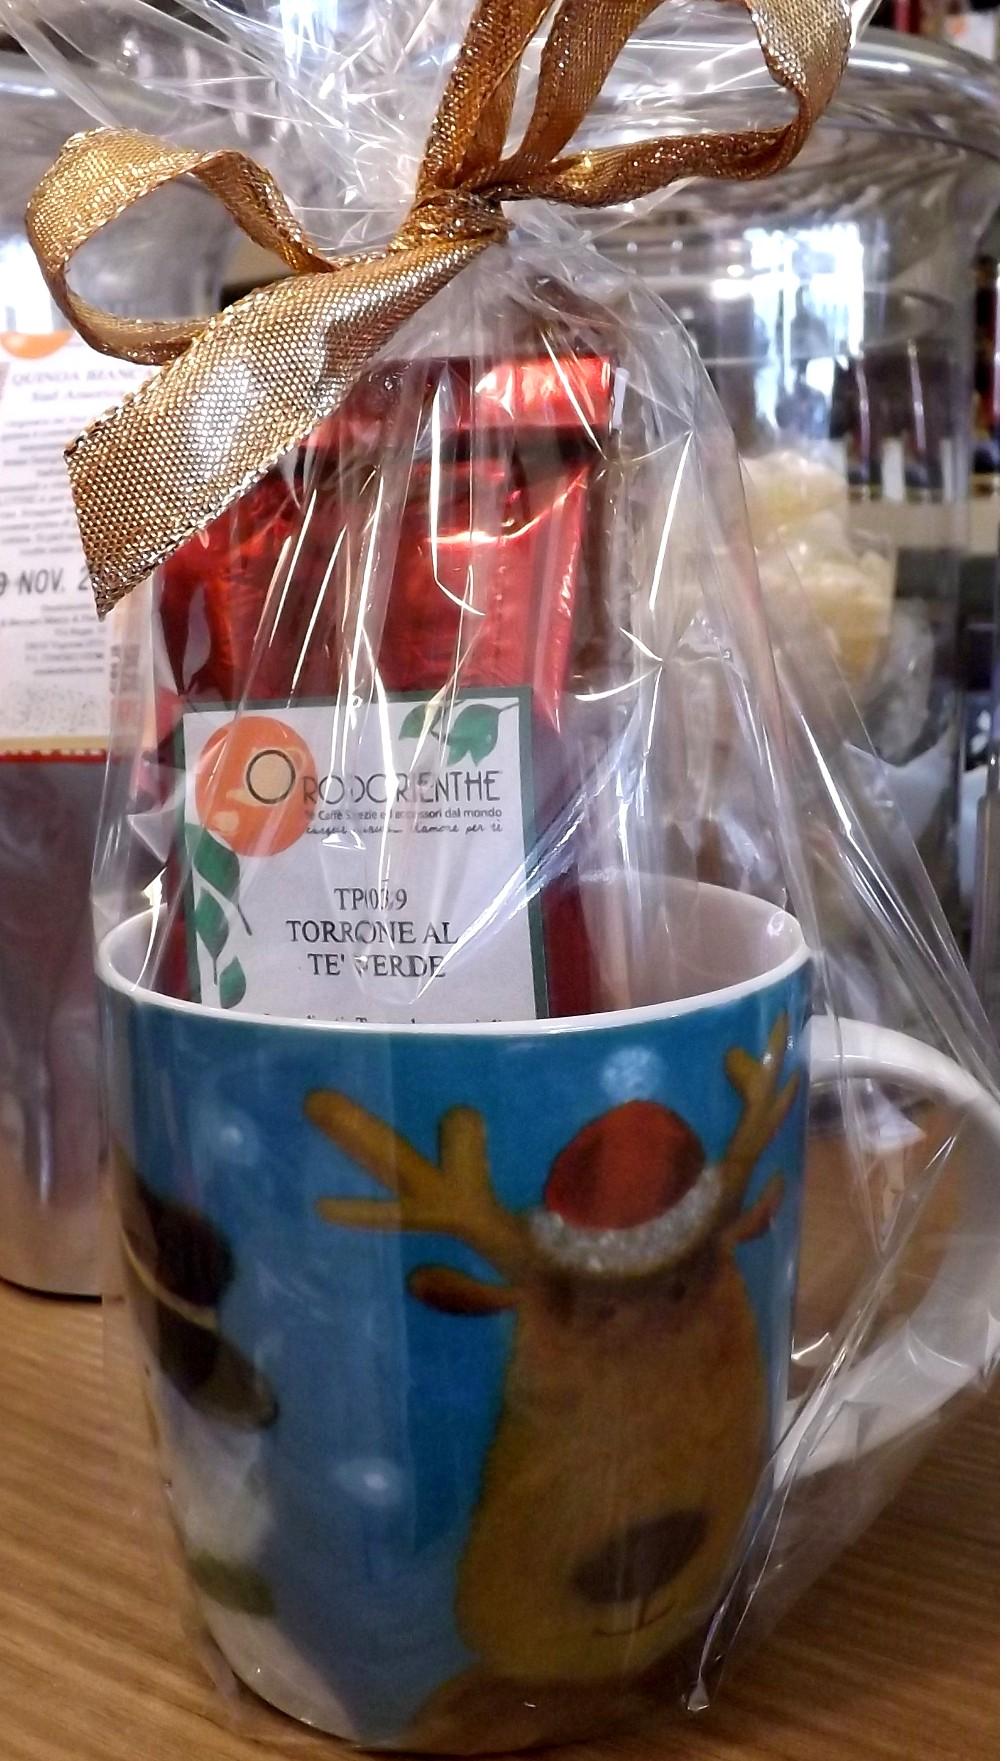 Natale 2015 tazze mug e tazze giapponesi orodorienthe for Tazze da regalare a natale